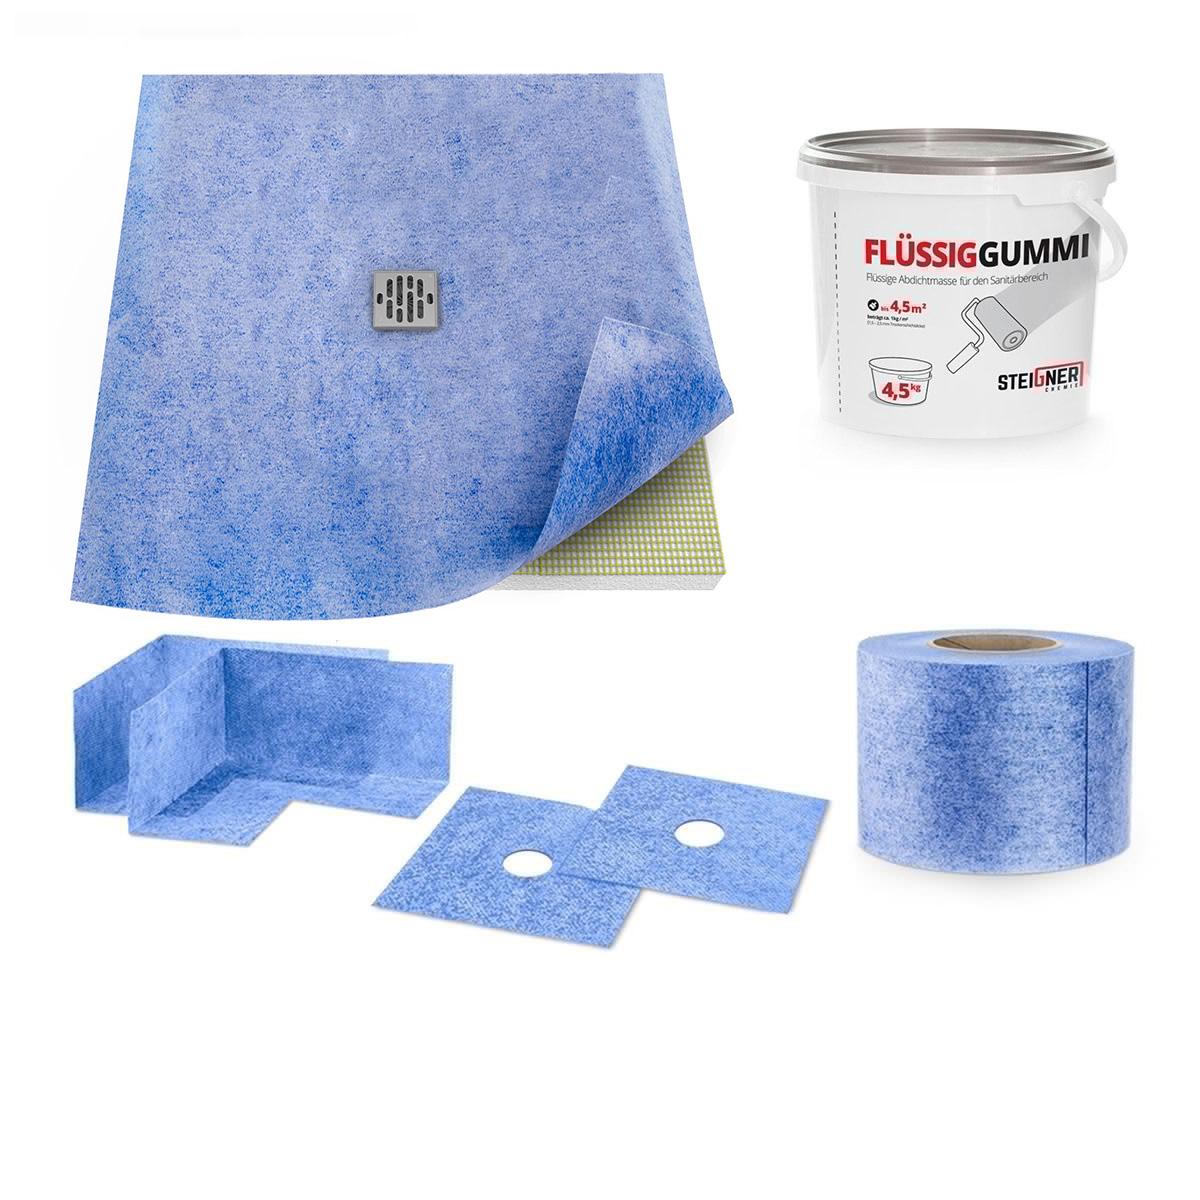 duschelement ebenerdig duschboard befliesbar duschtasse duschkabine edelstahl. Black Bedroom Furniture Sets. Home Design Ideas